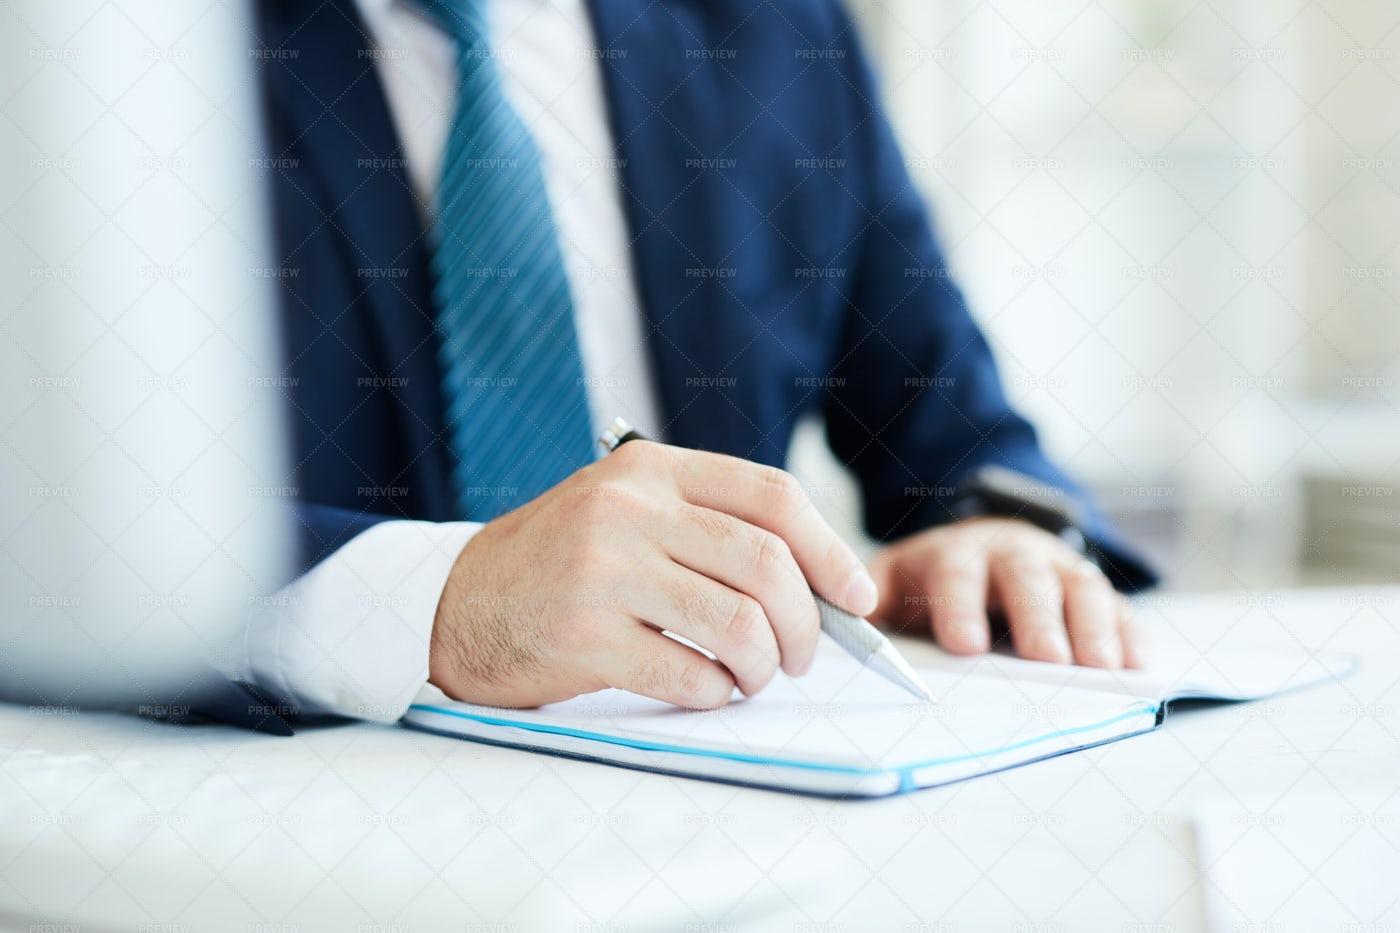 Writing Down Business Goals: Stock Photos